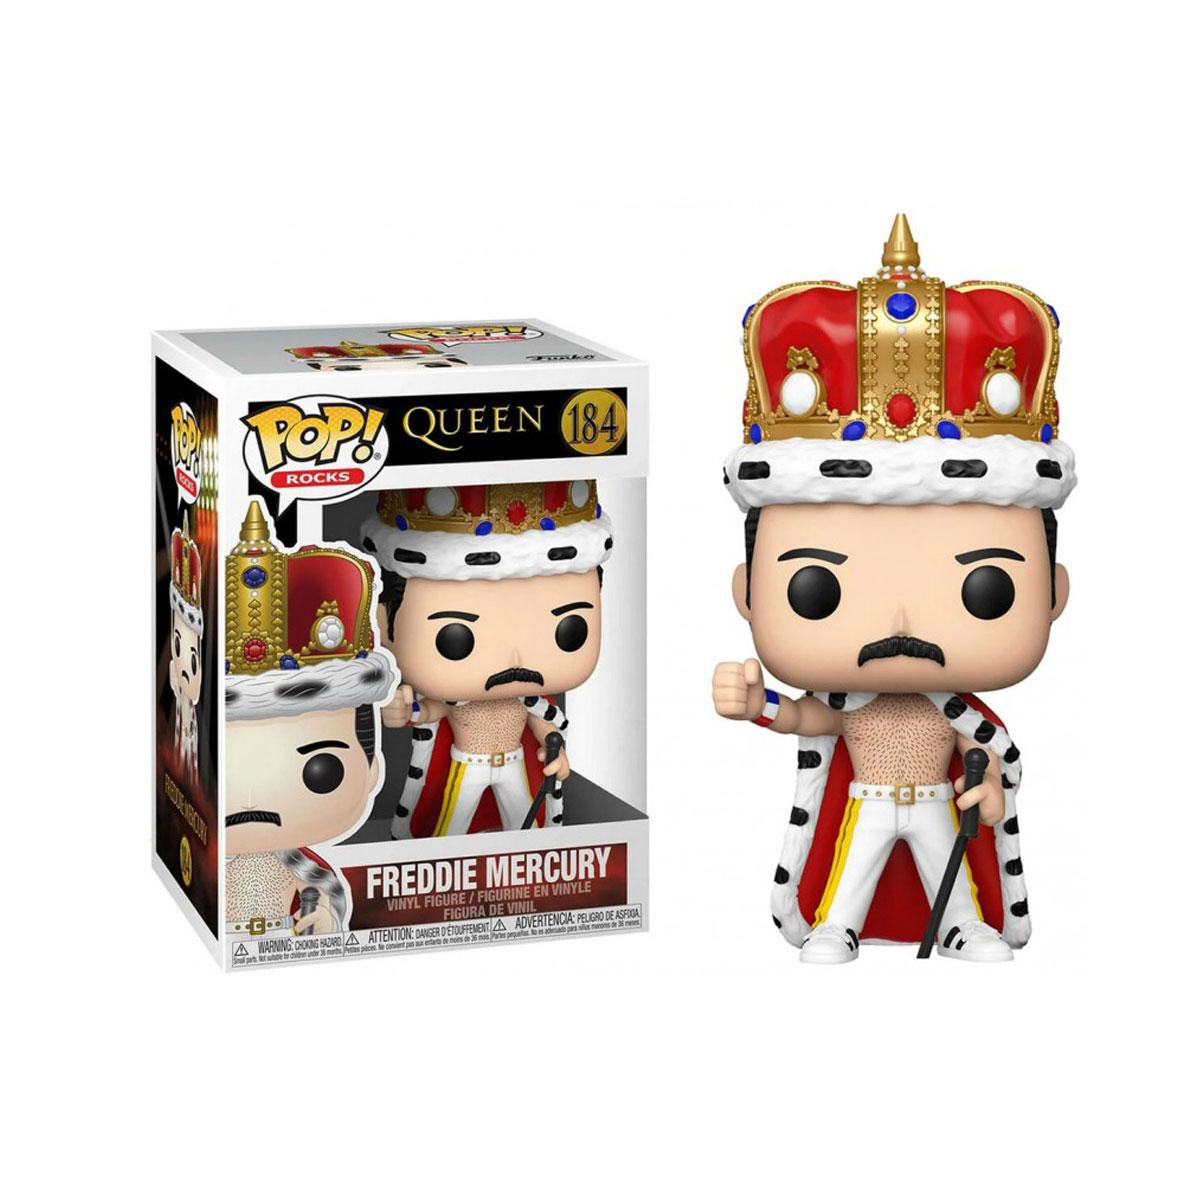 Funko Pop Queen Freddie Mercury King 184